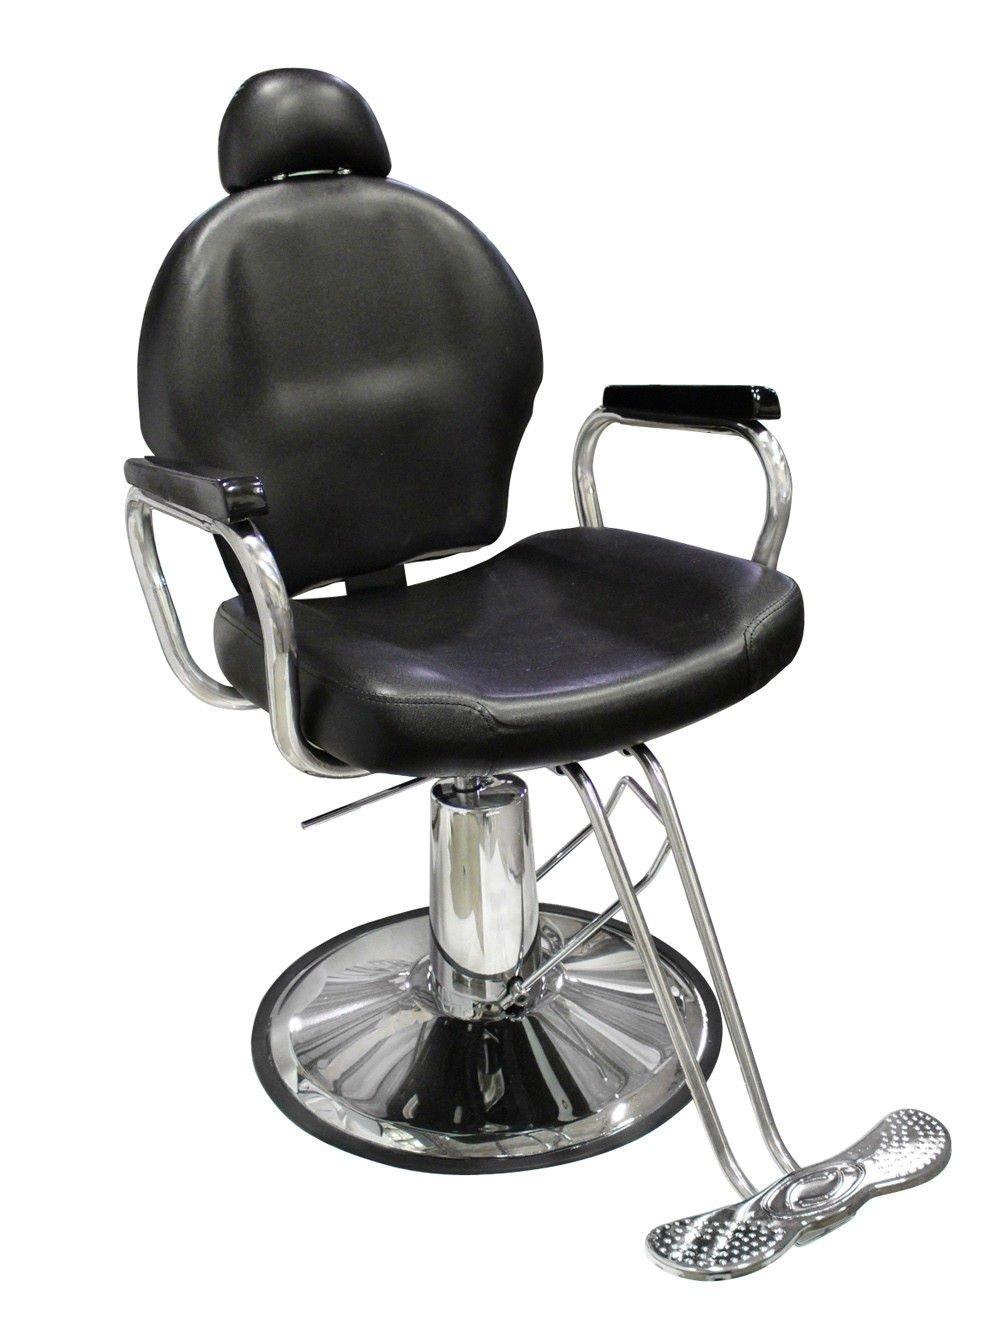 Wakrays New Reclining Hydraulic Barber Chair Salon Styling Beauty Spa Shampoo Equipment